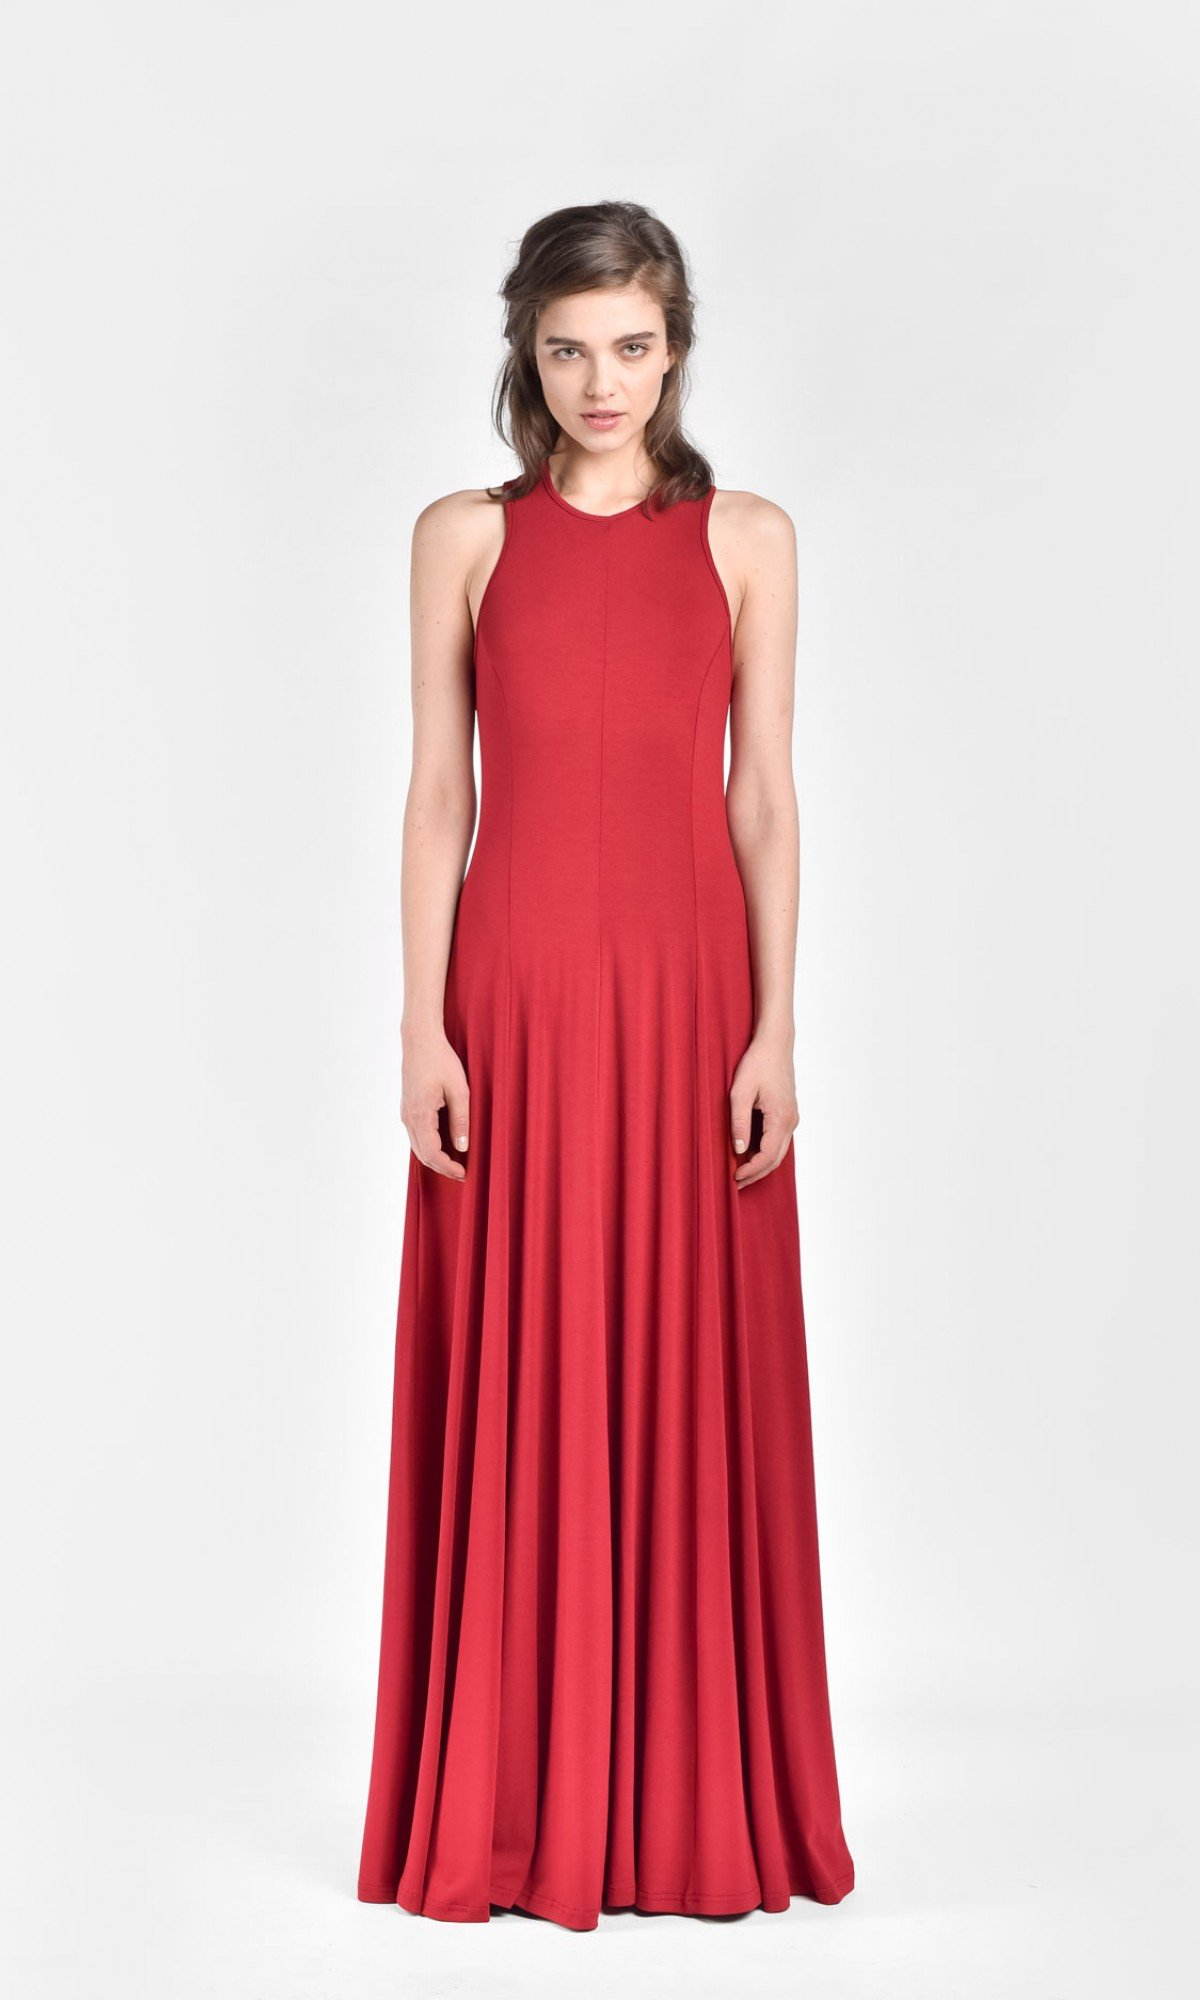 Cross Back Strap Maxi Dress A03414